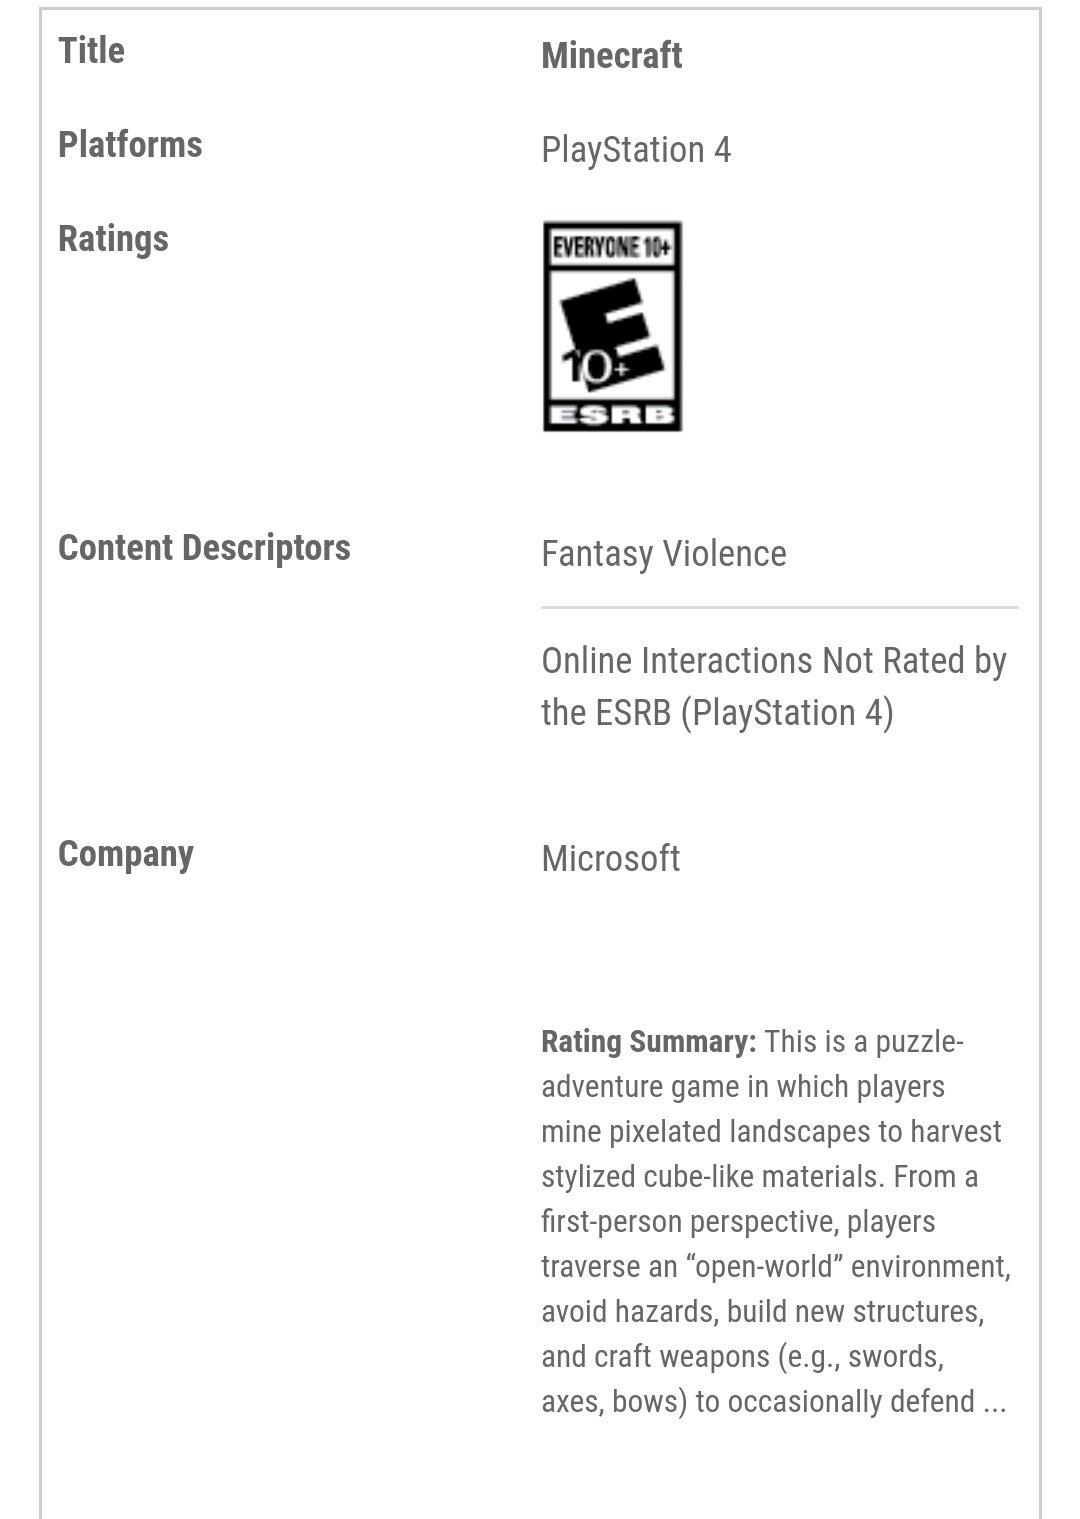 cY0FnVT - 【朗報】統合版MincraftのPS4版が北米レーティング機関に登録